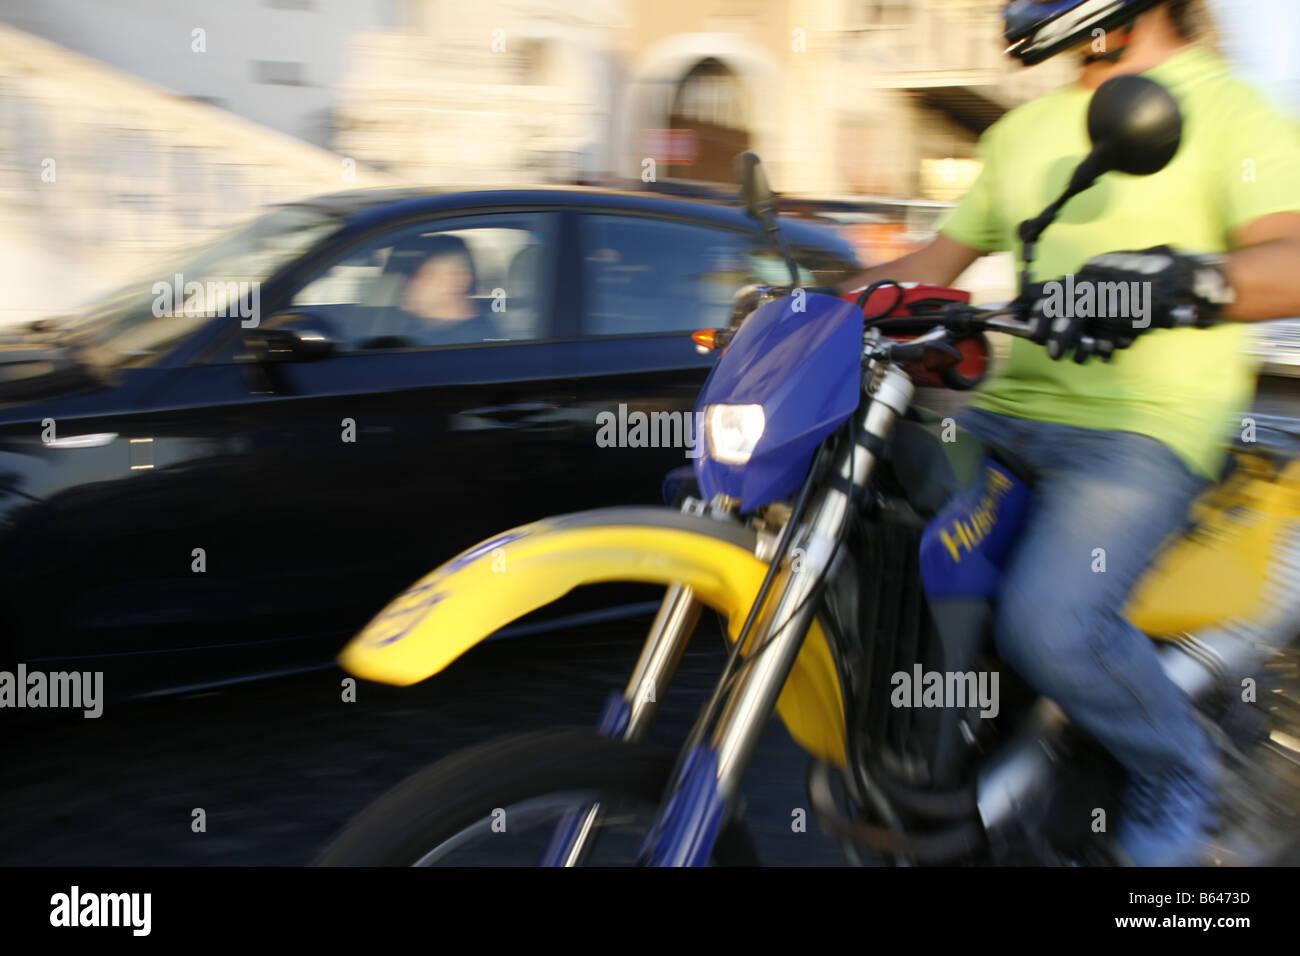 man riding husqvarna motorbike in street in city town - Stock Image